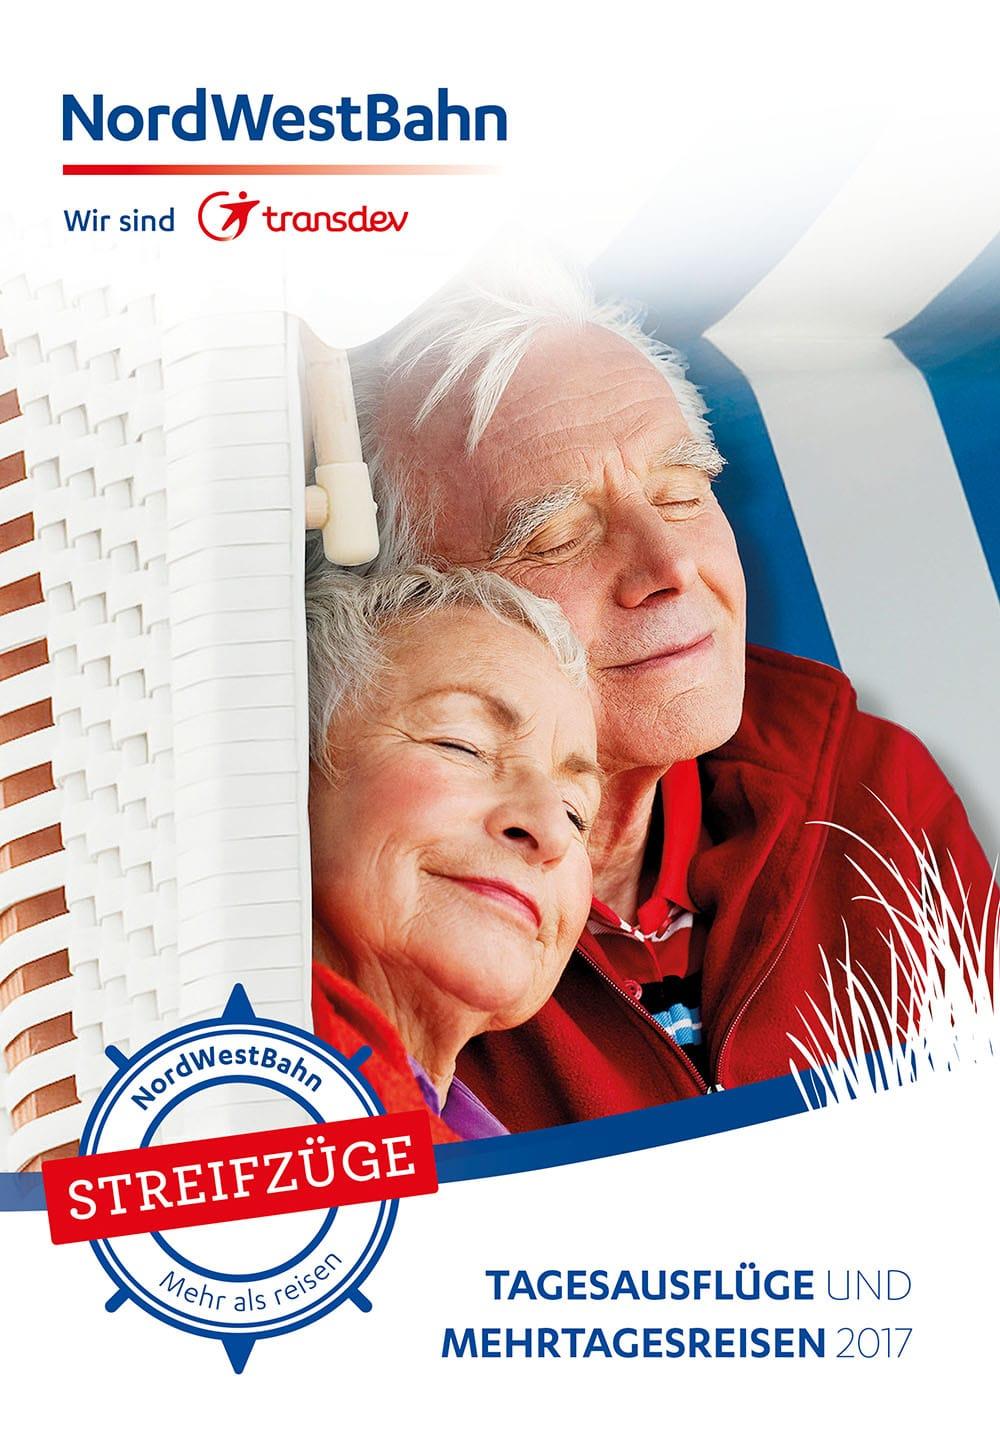 Grafikdesign - Nordsee-Reiseprogramm der NordWestBahn Osnabrück